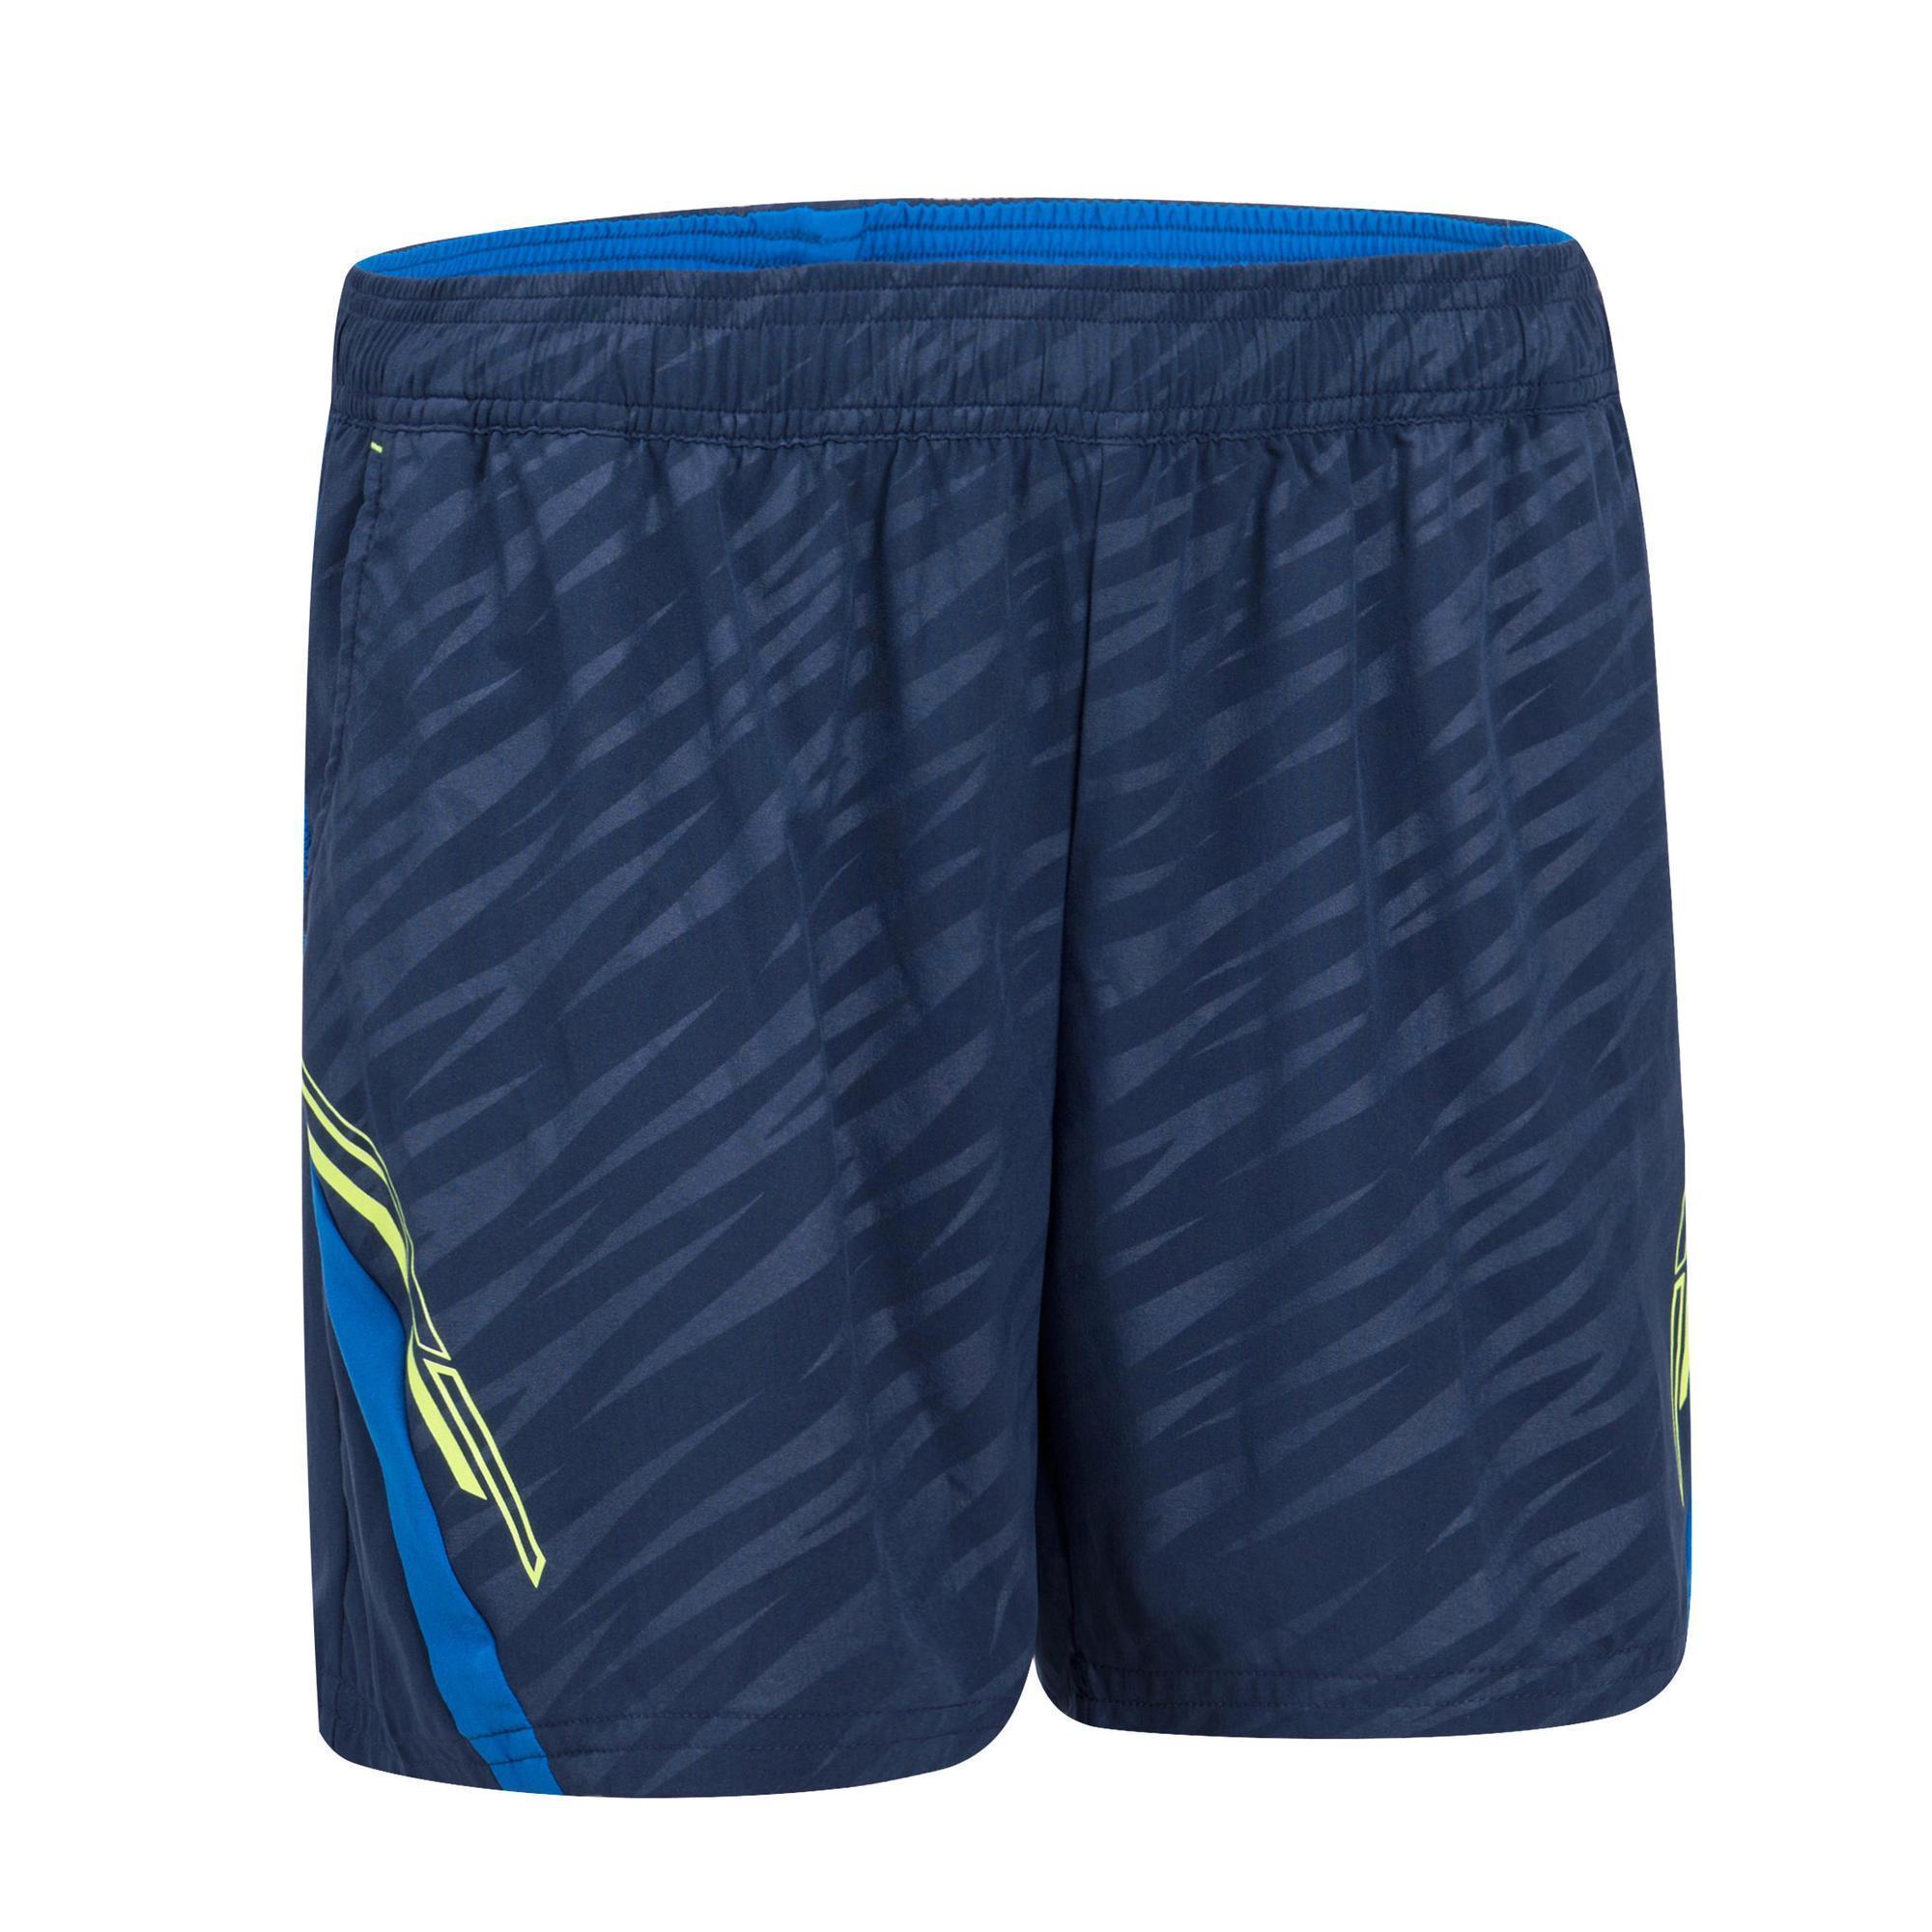 Artengo Damesshort 860 marineblauw/geel badminton